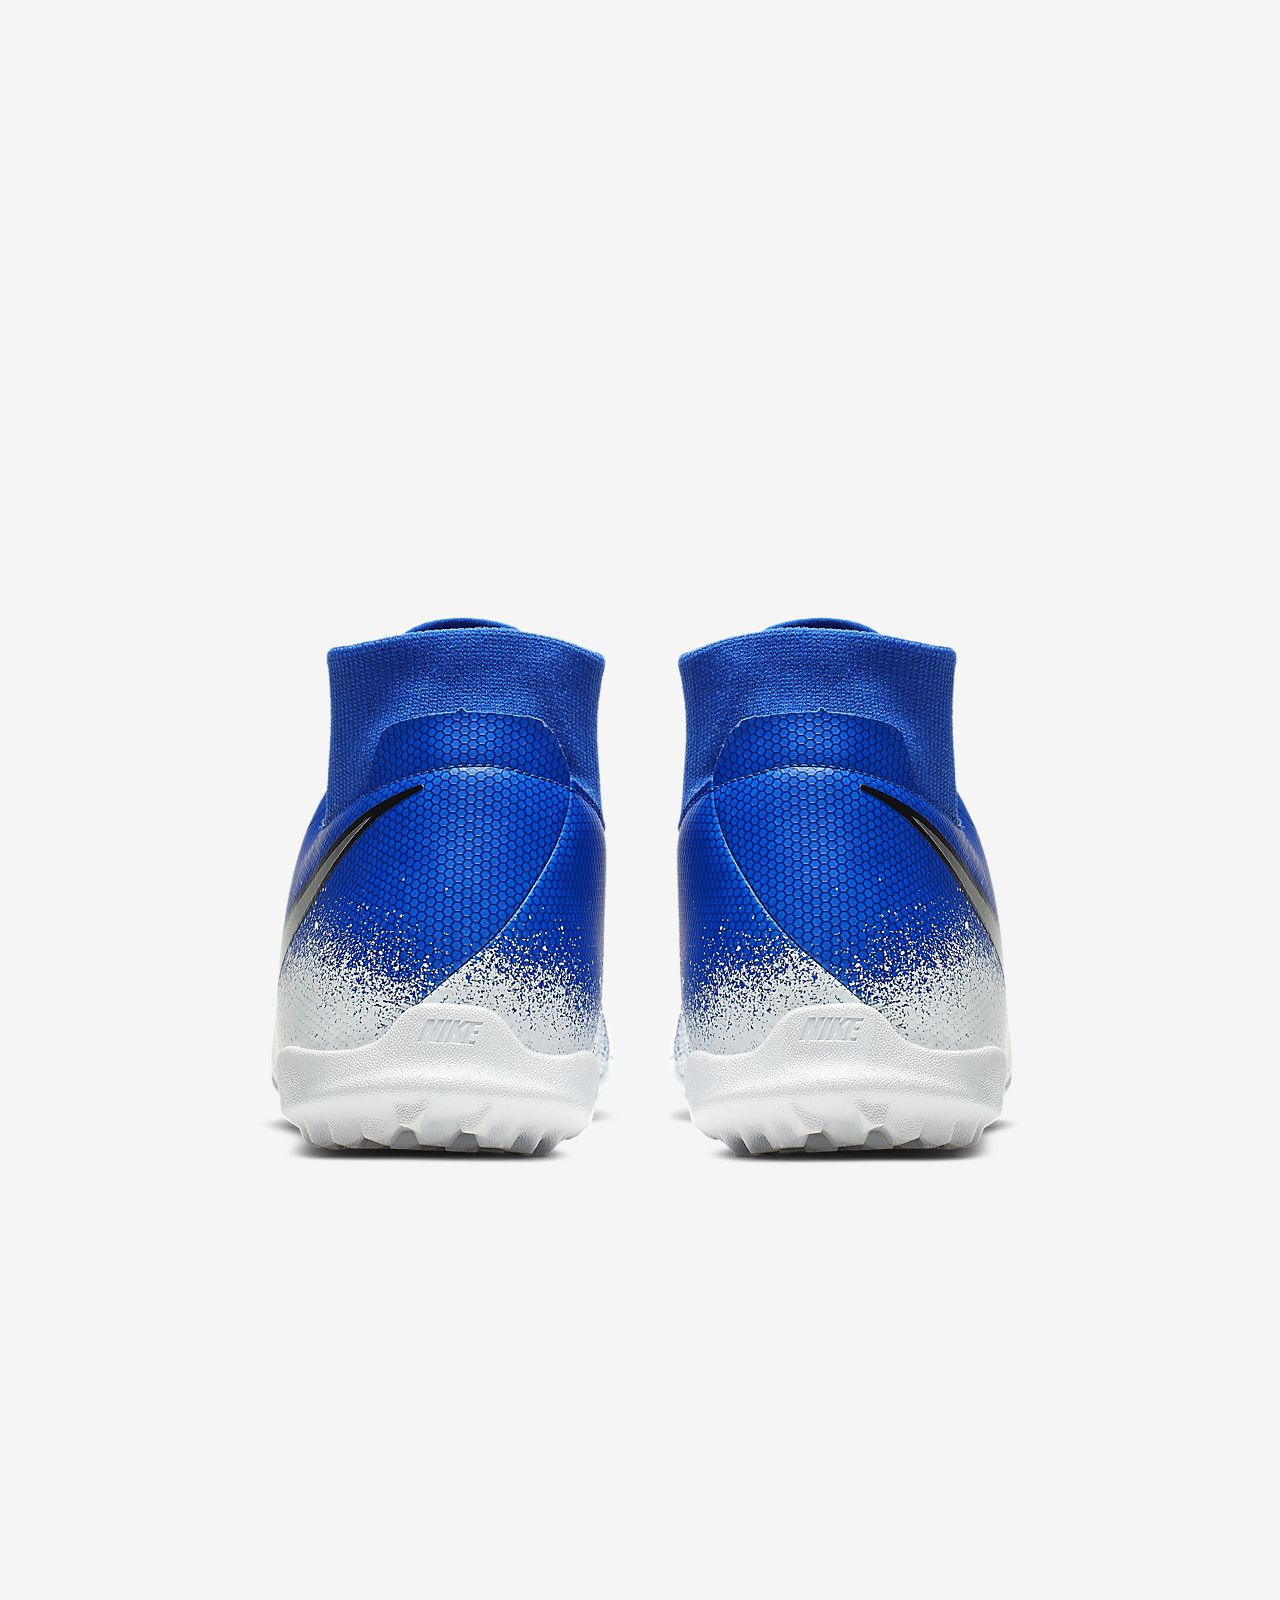 online retailer 07d12 23c70 ... Fotbollssko för grus turf Nike Phantom Vision Academy Dynamic Fit